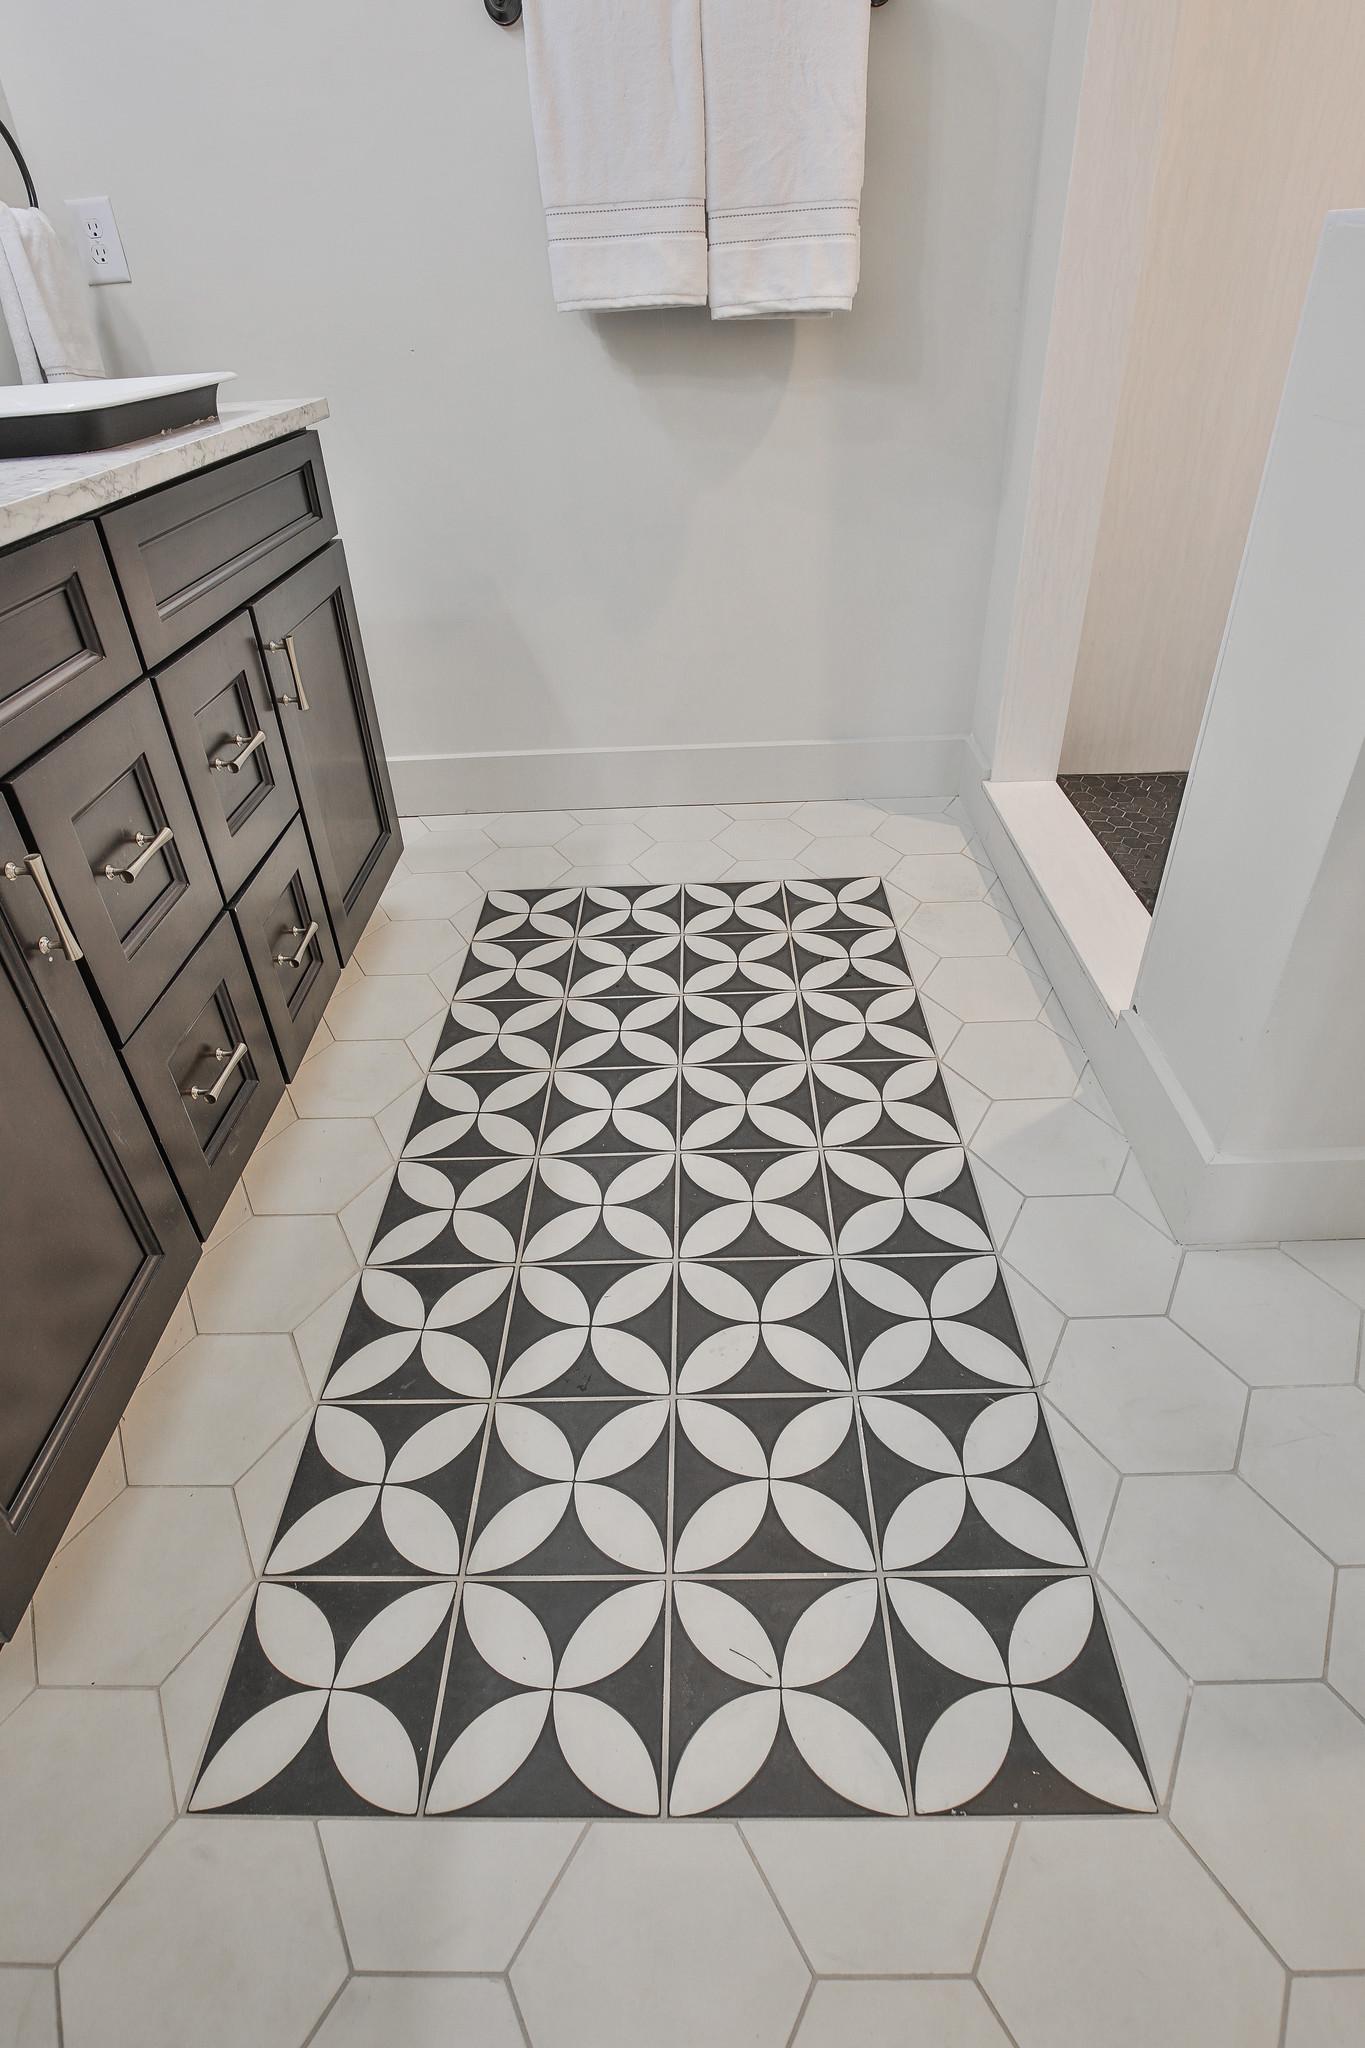 Sinks/Faucets/Shower Hardware: Kohler, Tile Floor: Cement Tile Shop, Shower surround and counters: Hanstone Quartz, Drawer Pulls: Liberty Hardware, Lighting: Savoy House, Vanity: Forevermark Cabinetry